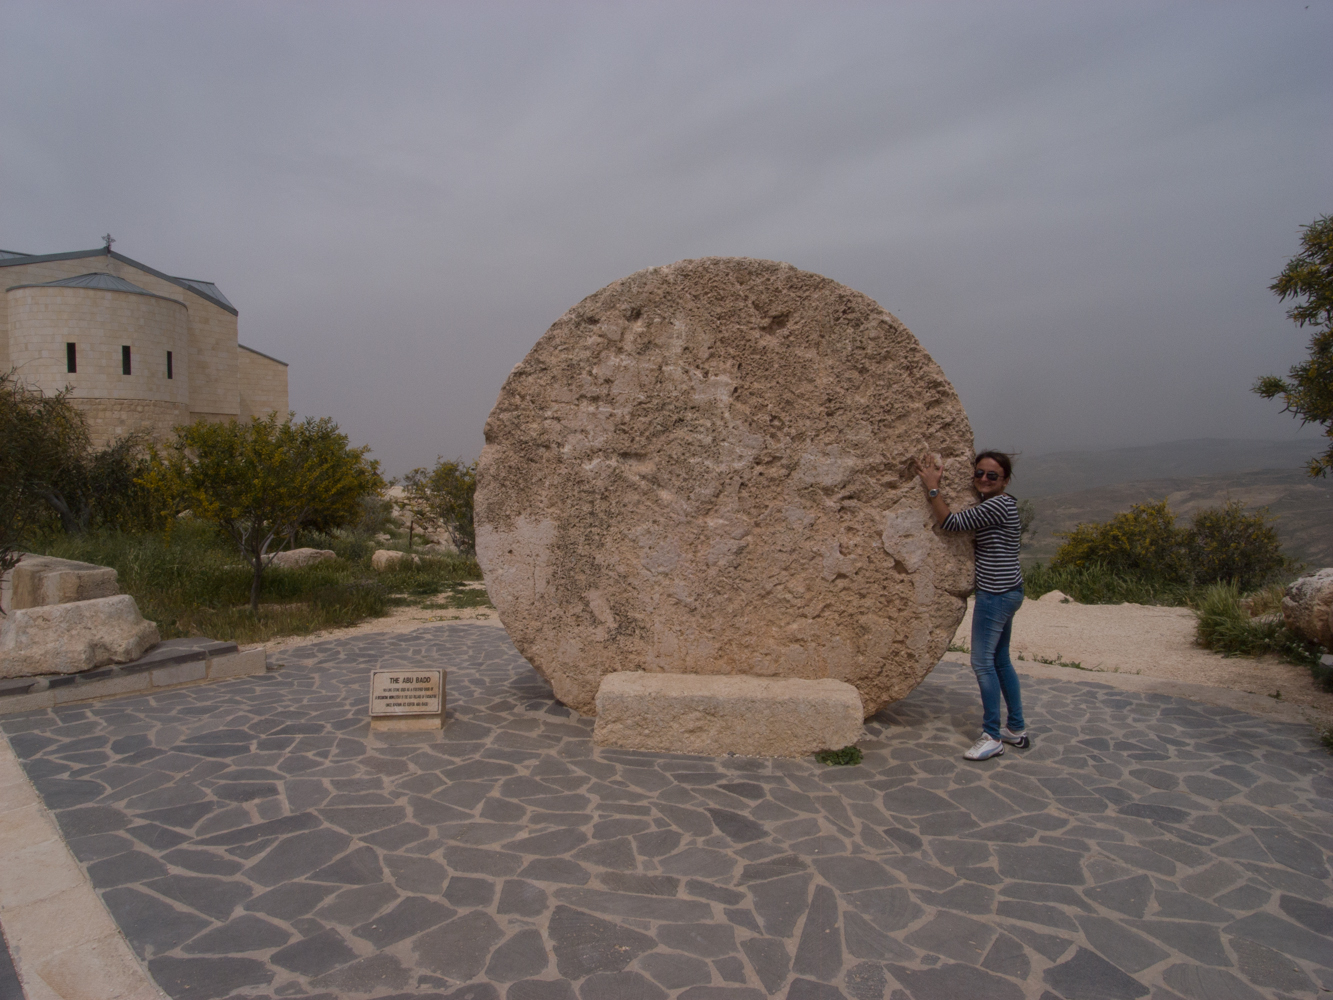 Jordanien_Aqaba_Rotes_Meer_Amman_Fotos-18